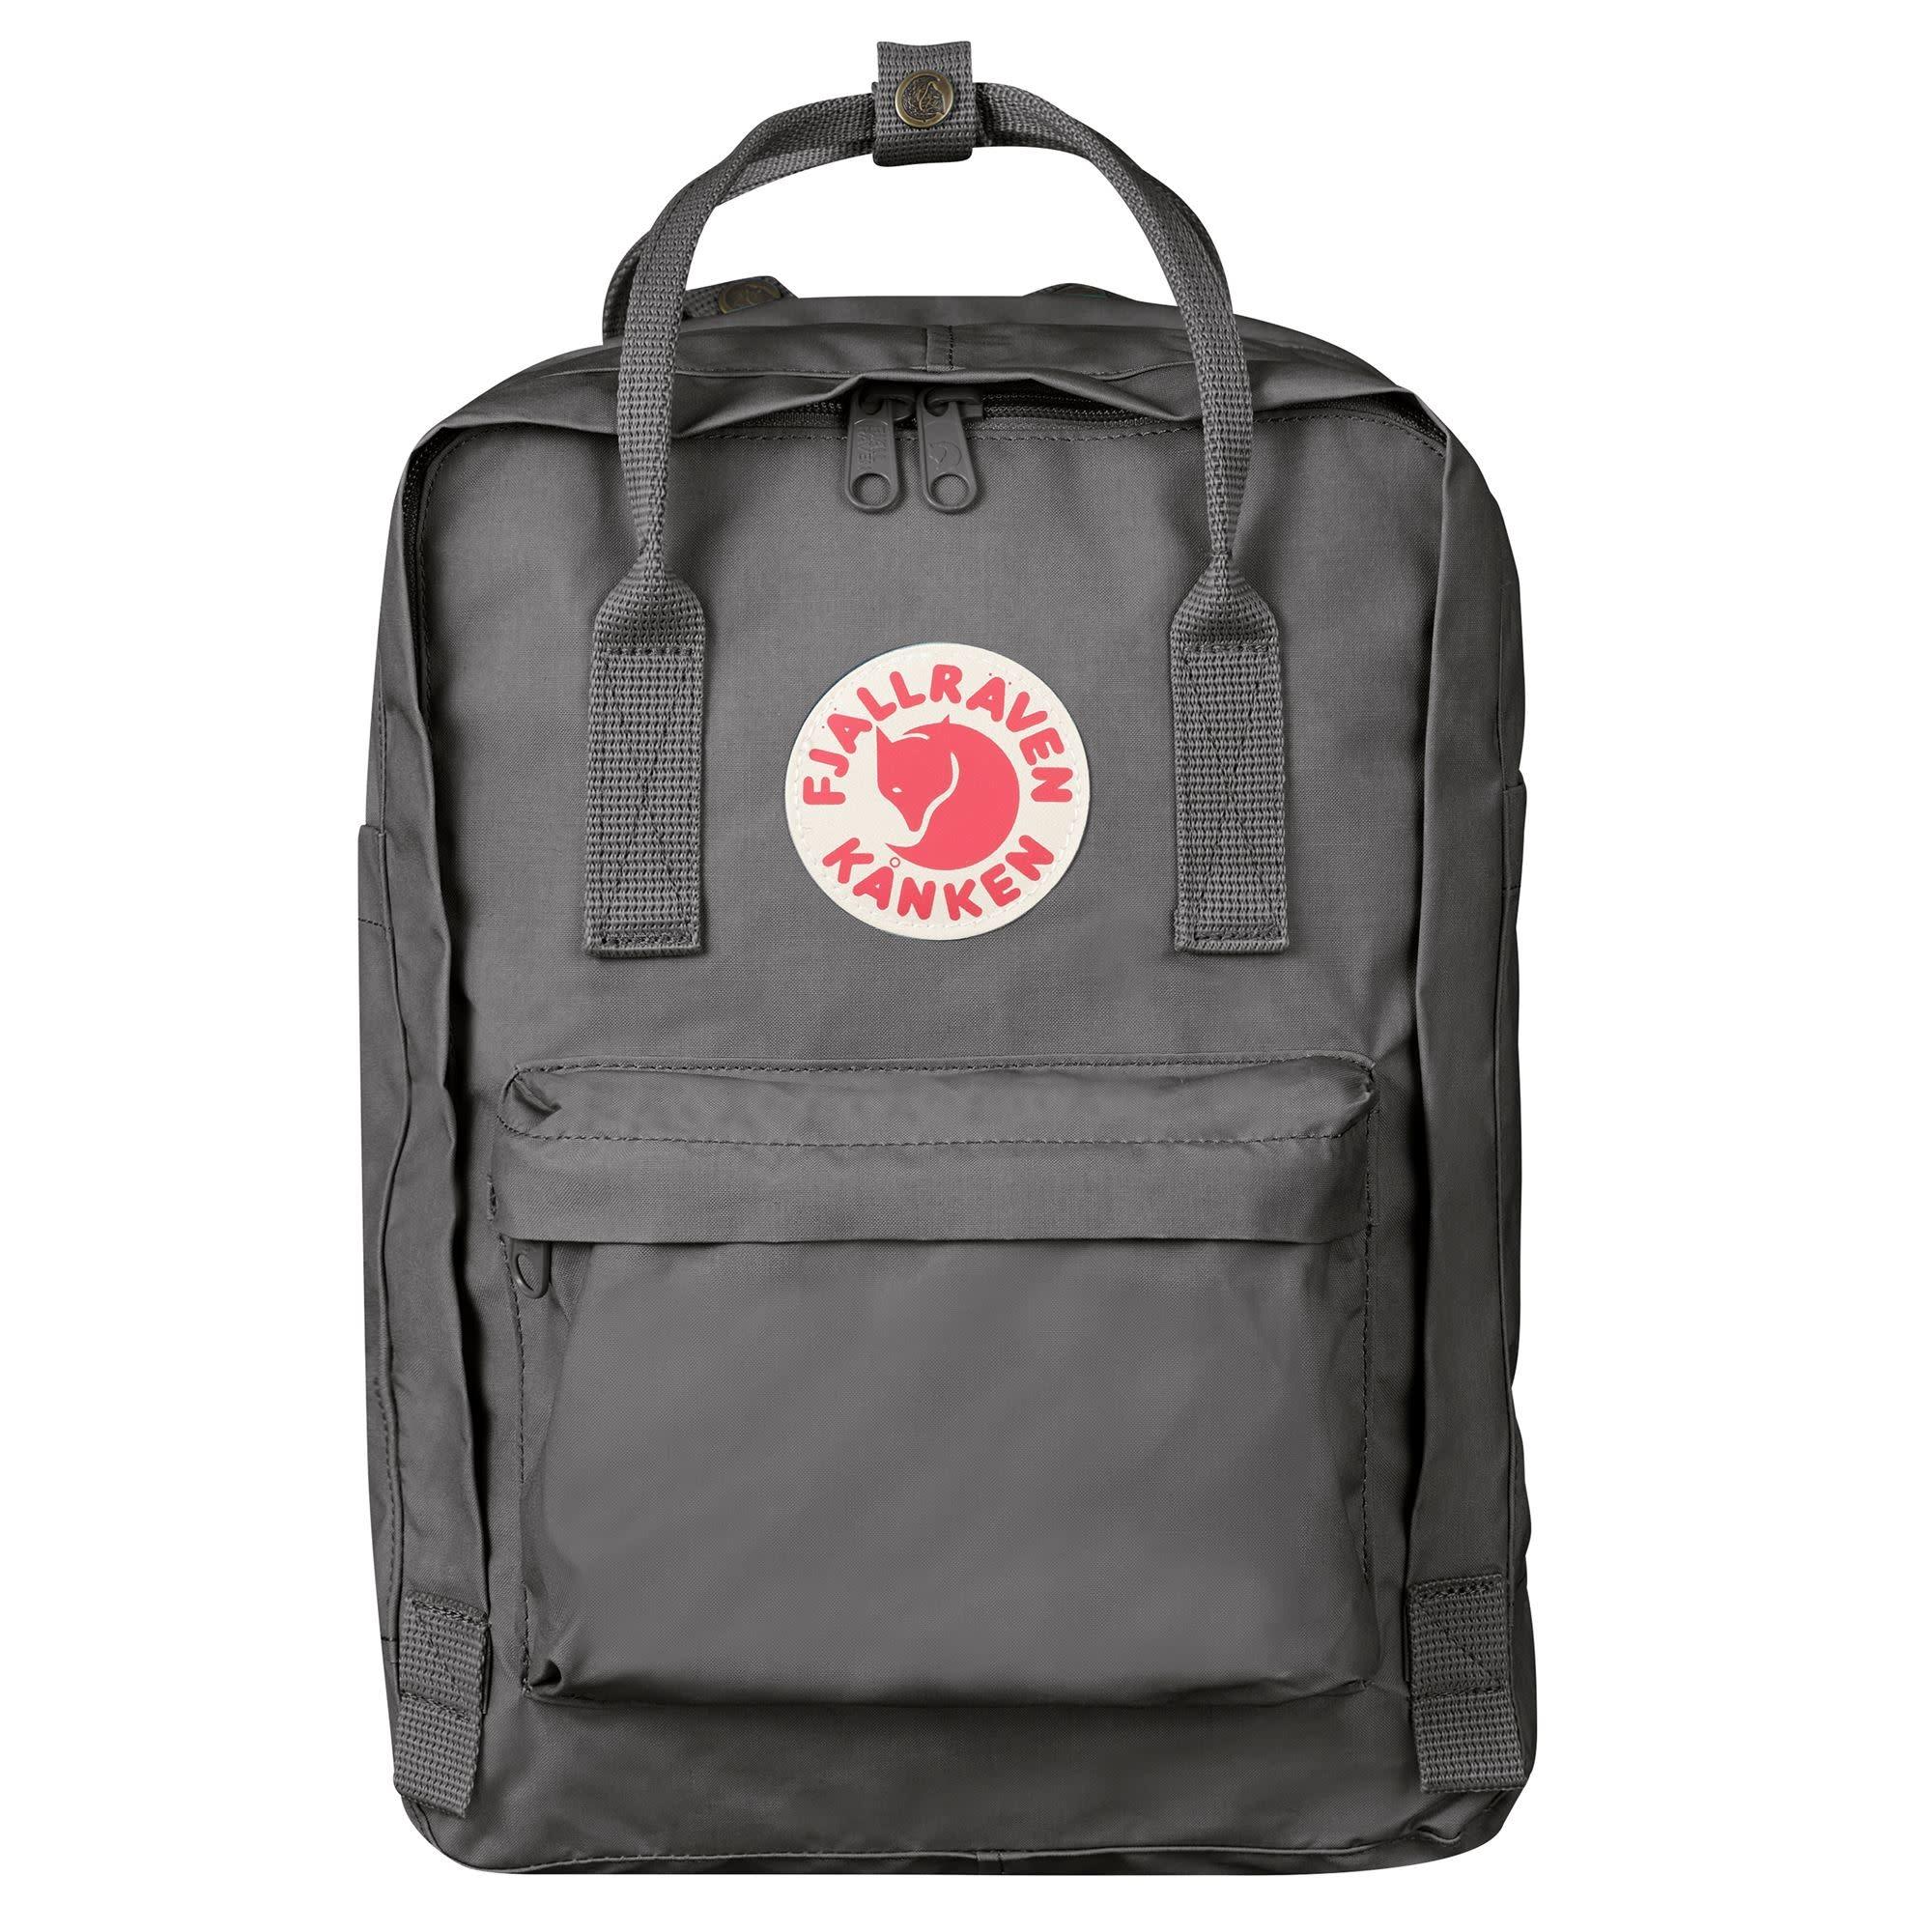 "Fjallraven Arctic Fox LLC Fjallraven Kanken 13"" Laptop Backpack - Super Grey"